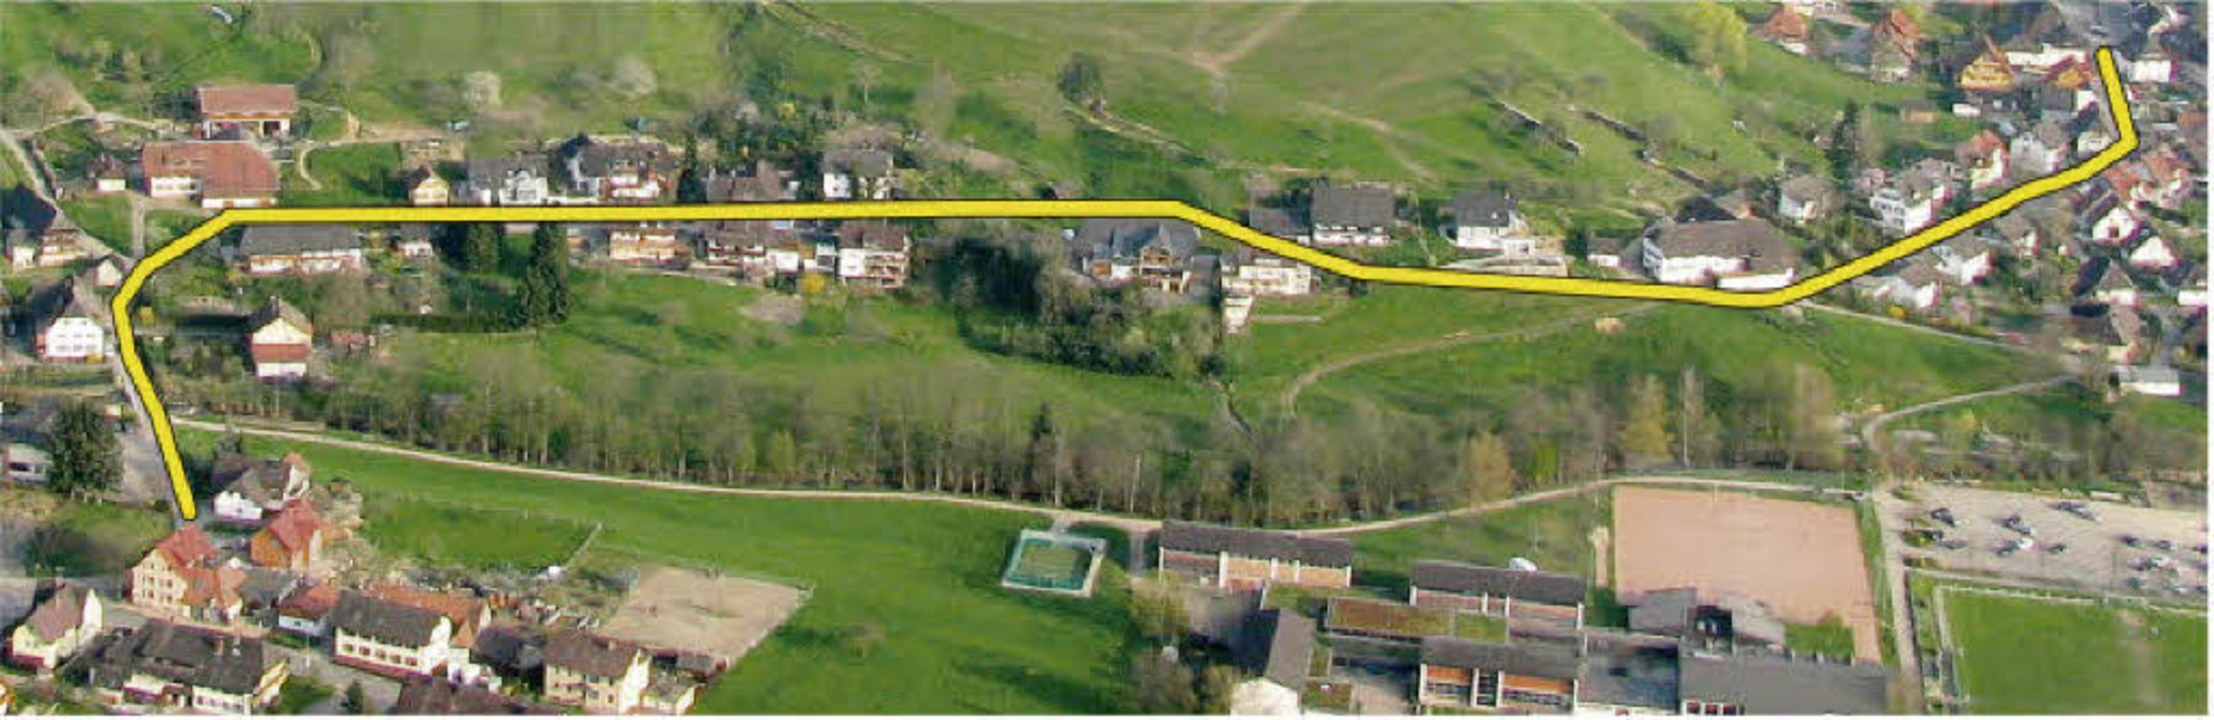 Rund 700 Meter lang ist in Münstertal ...beiträgen herangezogen werden sollen.   | Foto: Manfred Lange